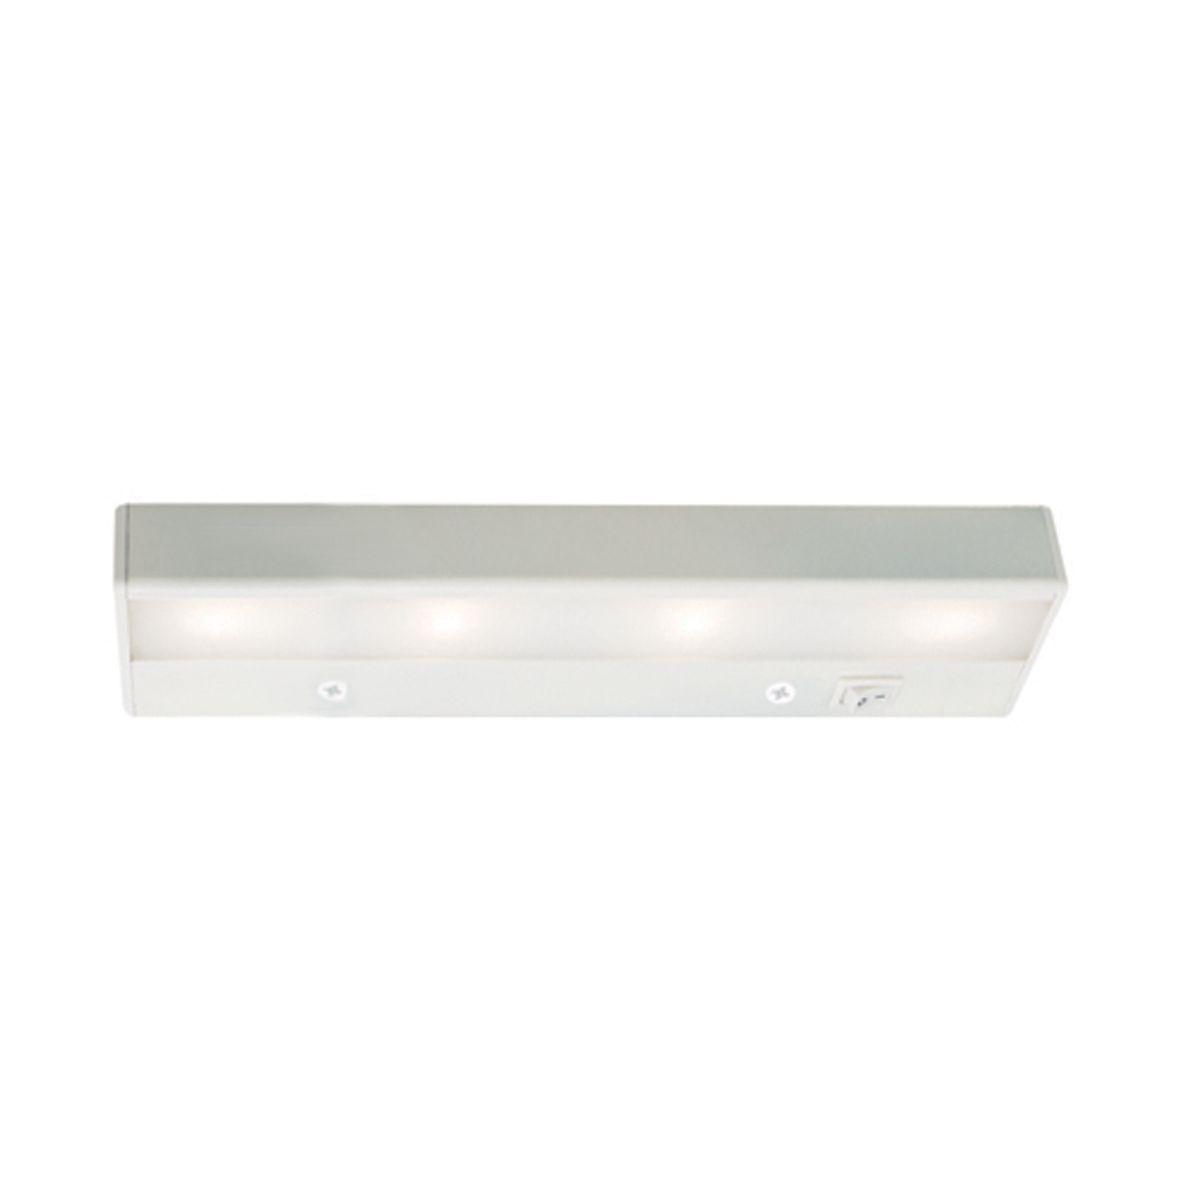 "BA-LED4-BB WAC LED 12"" 120V Light Bar 3000K Soft White Brushed Bronze"